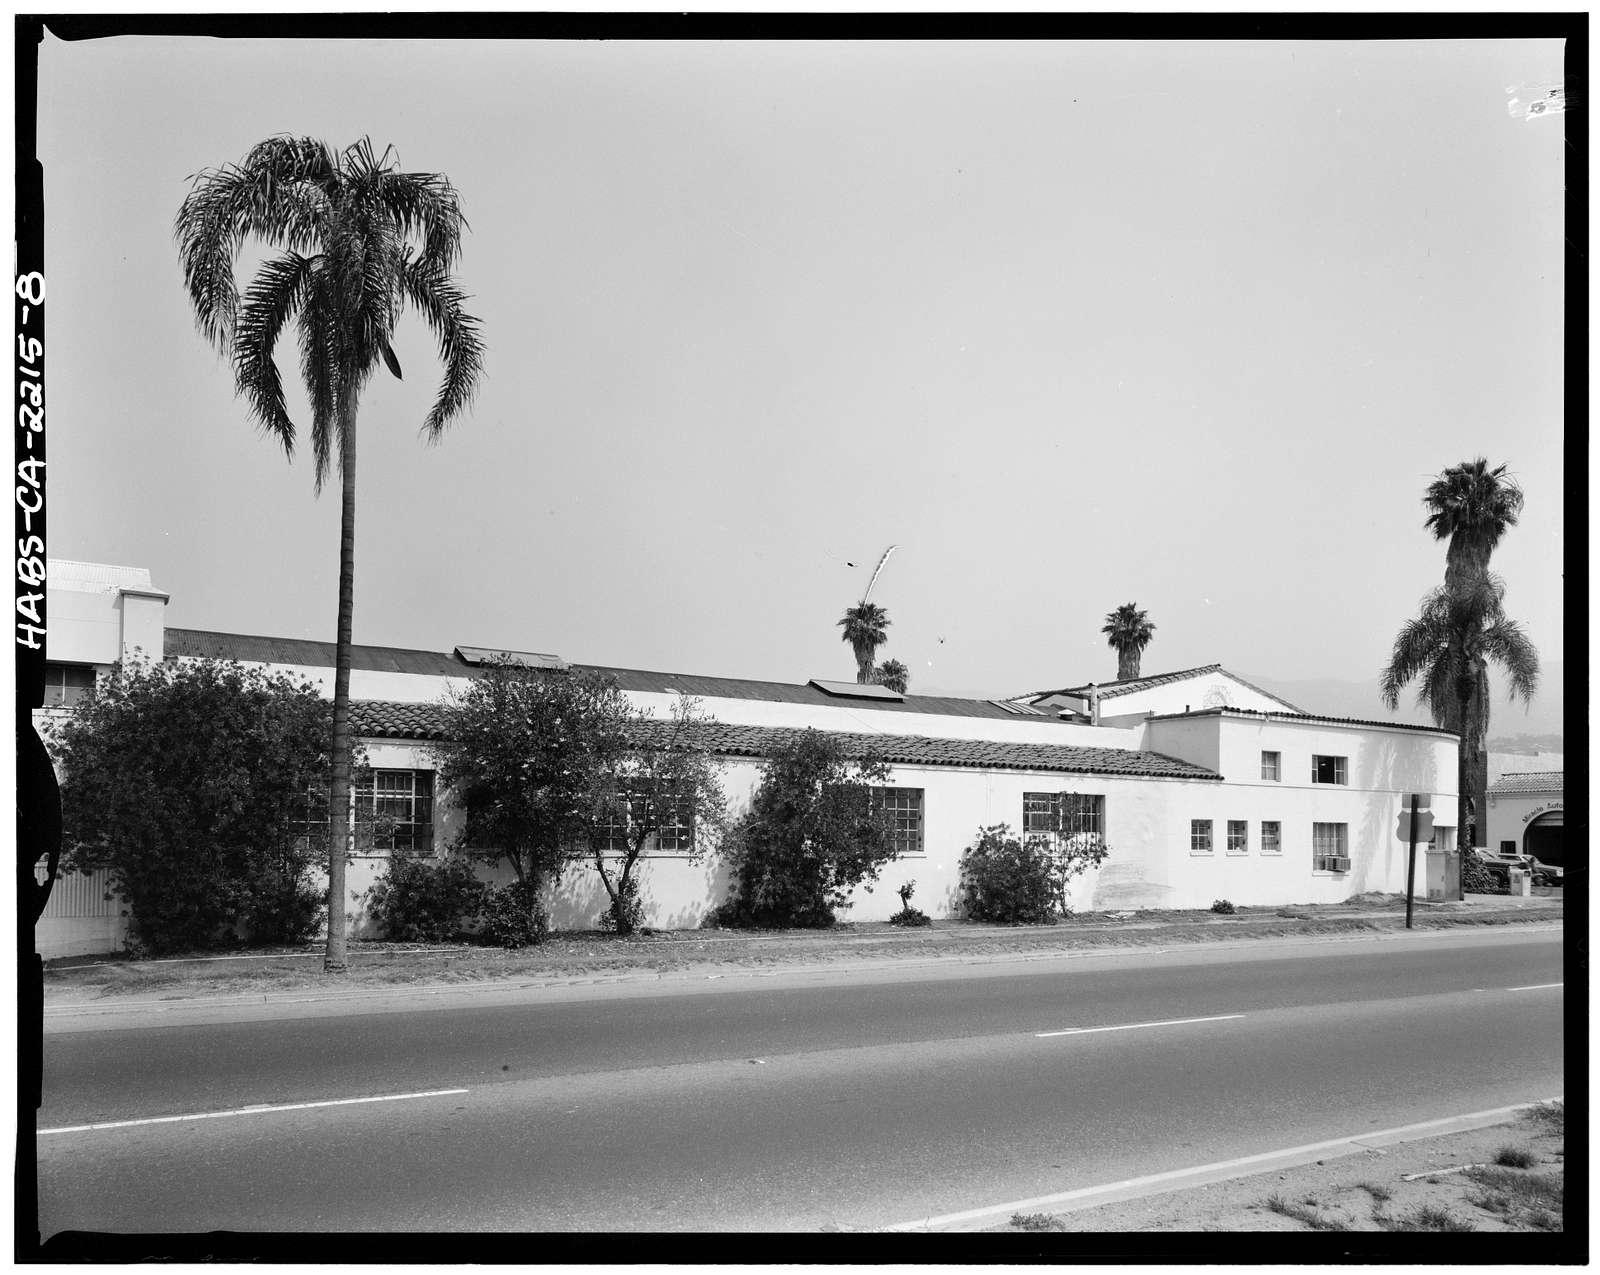 V.E. Wood Auto Building, 315 State Street, Santa Barbara, Santa Barbara County, CA